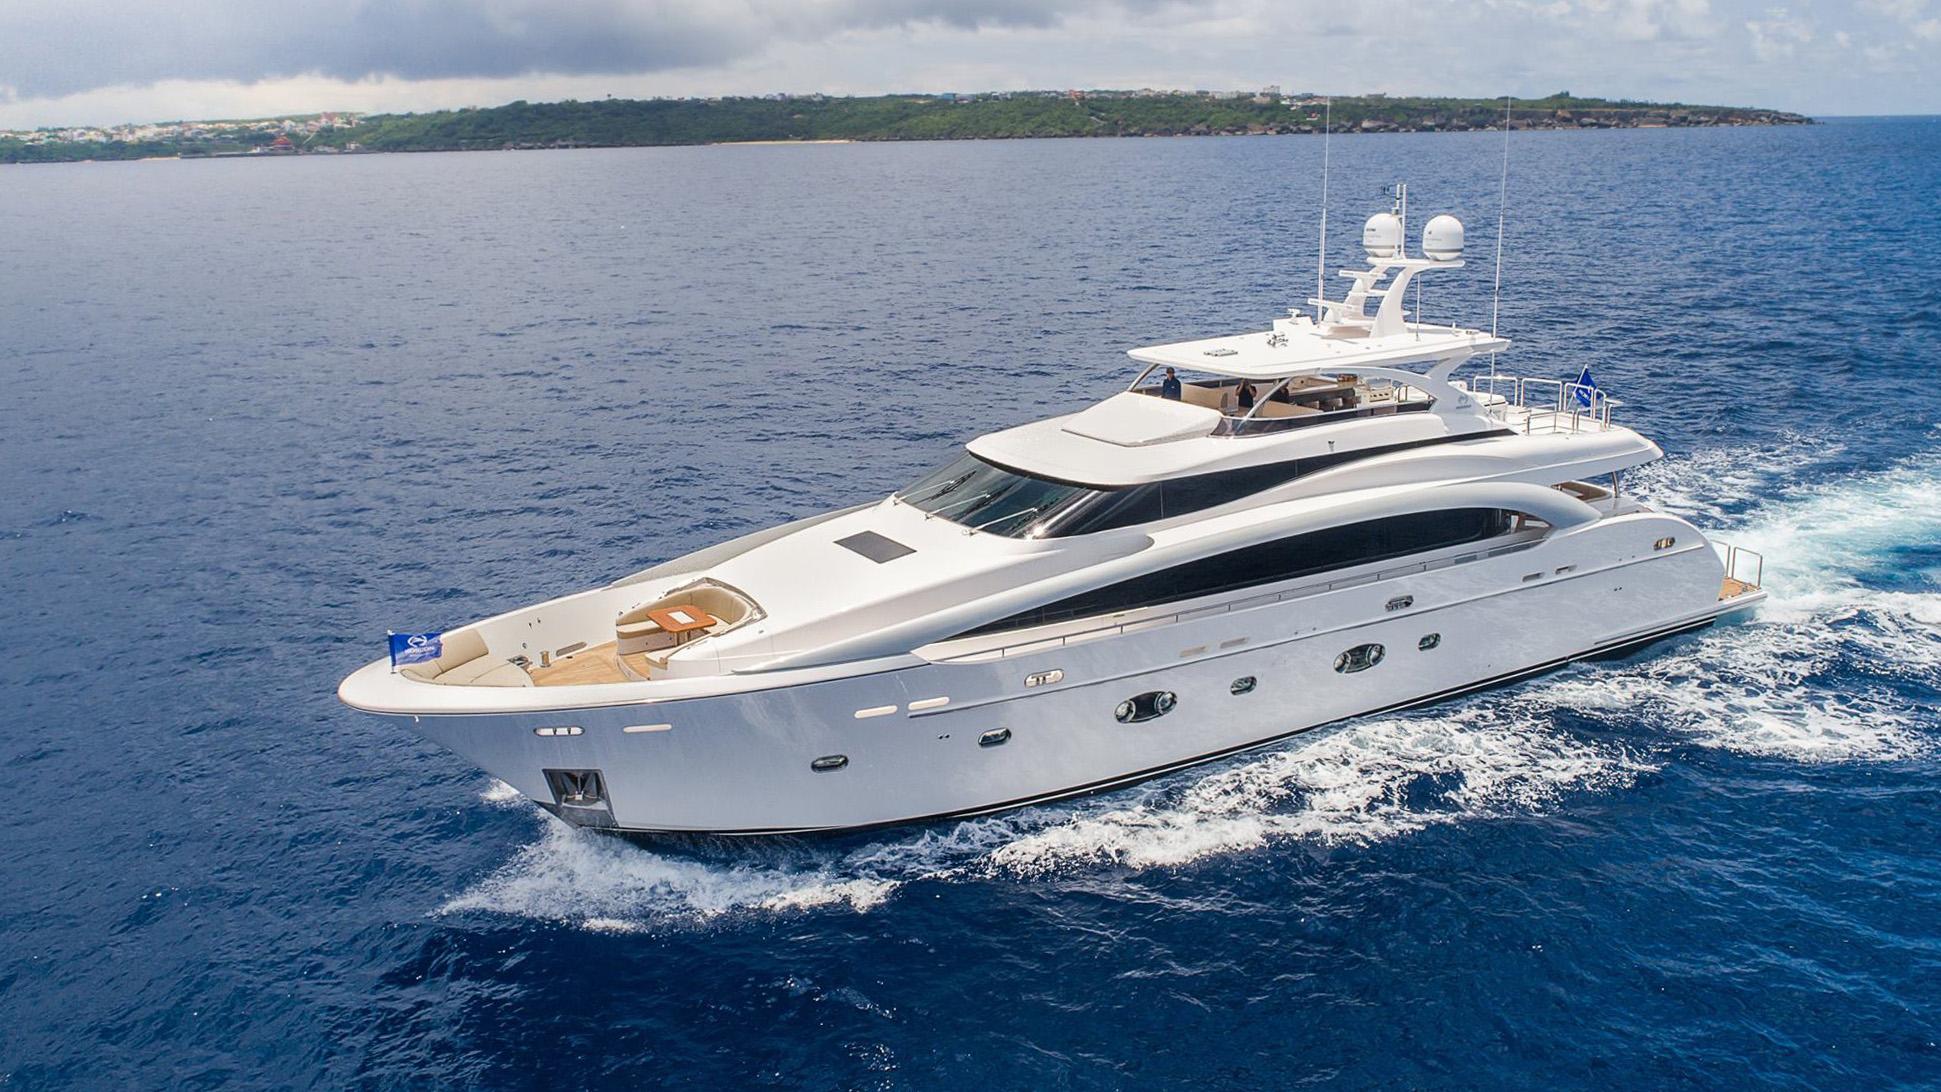 rp110 hull 4 motoryacht horizon 34m 2017 half profile